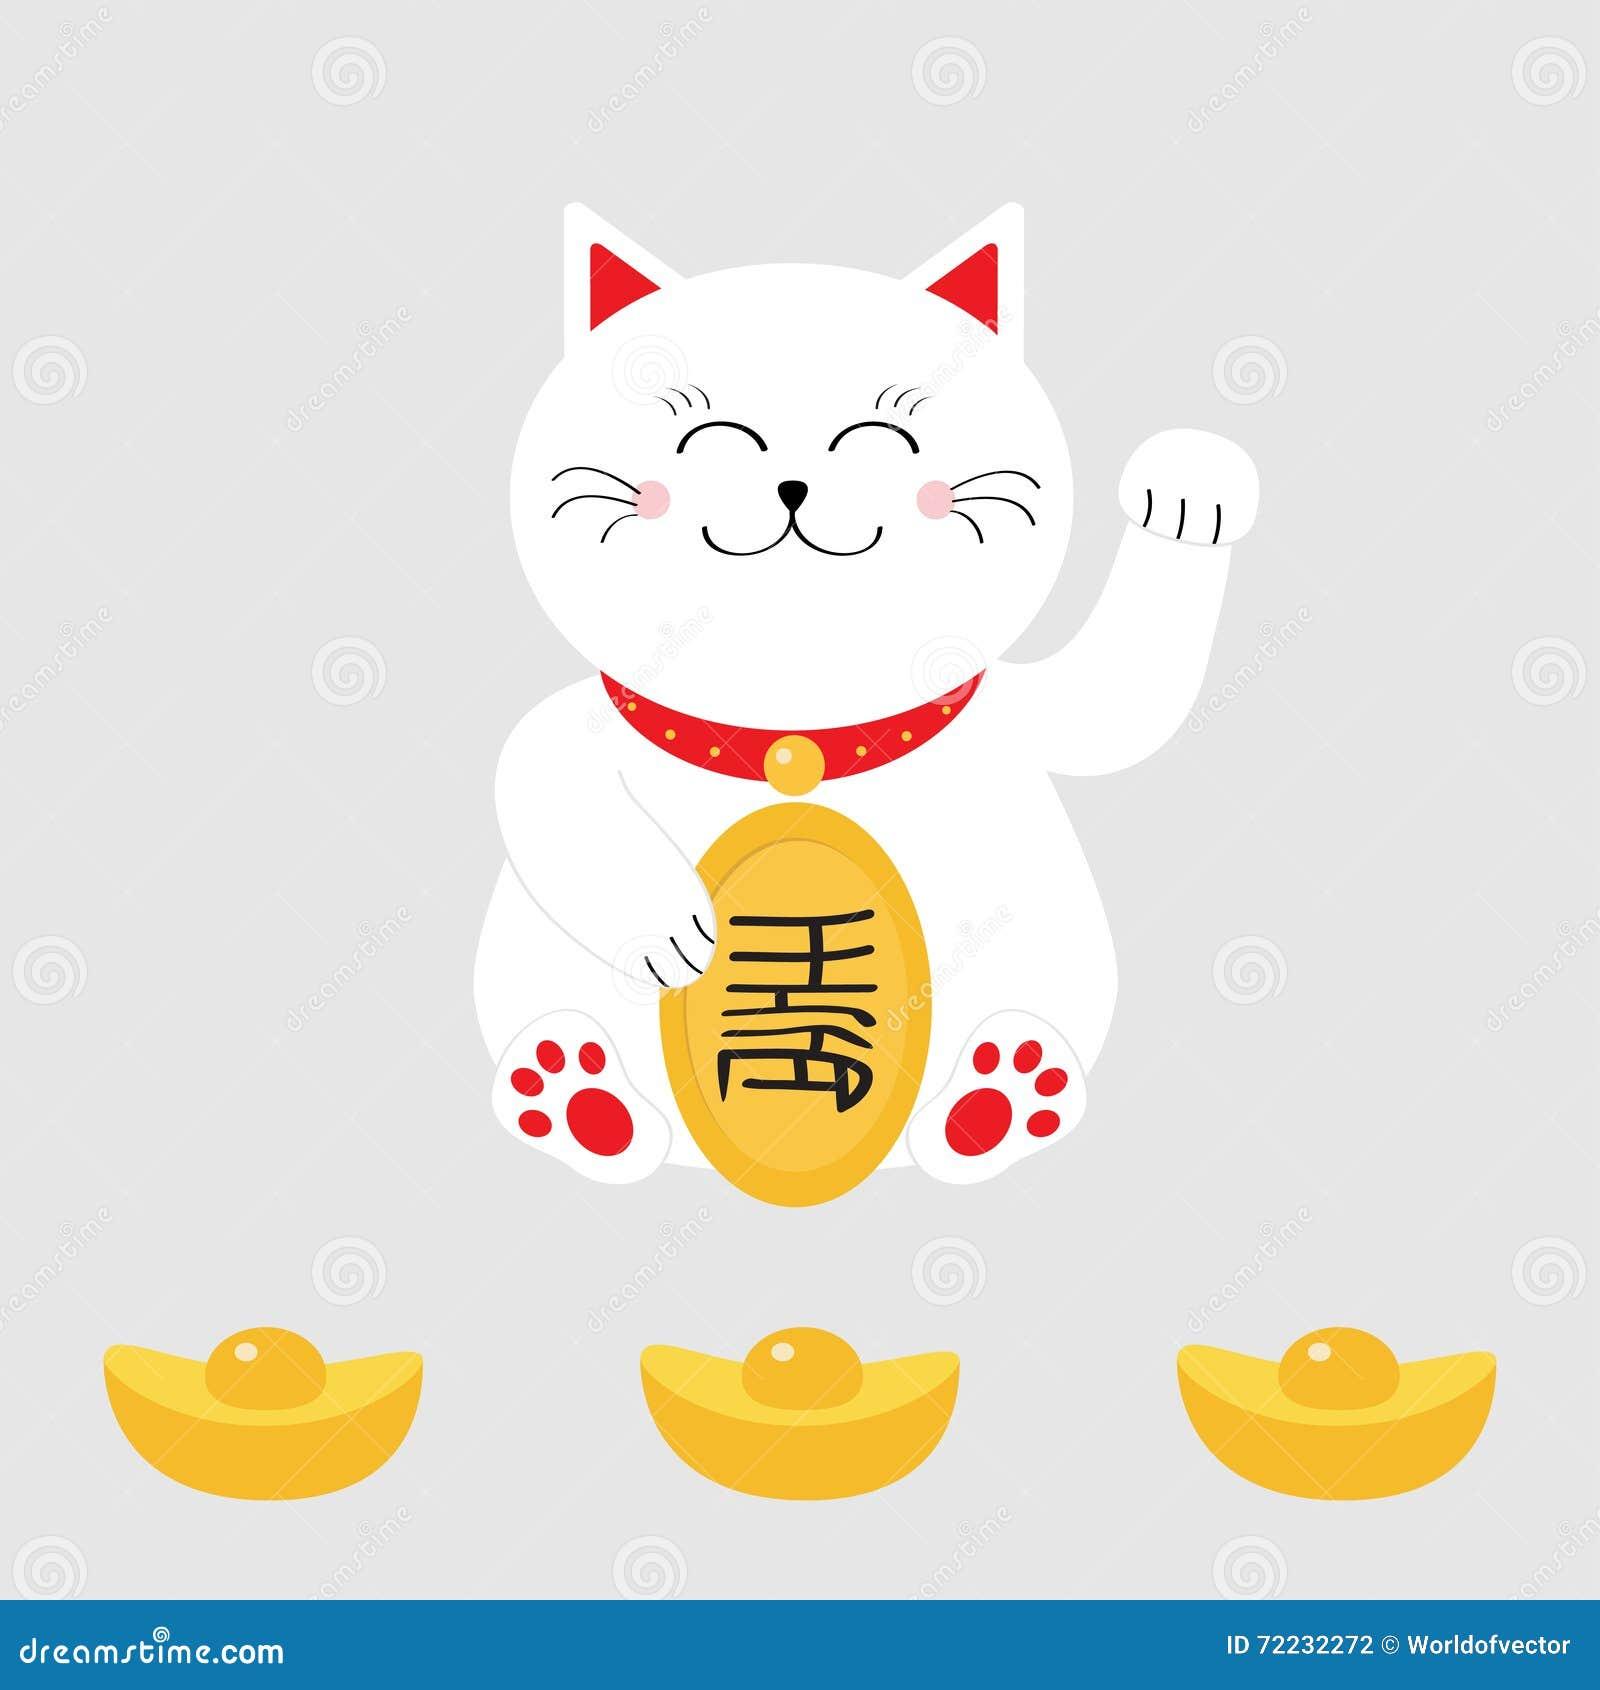 Lucky cat holding golden coin japanese maneki neco cat waving lucky cat holding golden coin japanese maneki neco cat waving hand paw icon chinese buycottarizona Images